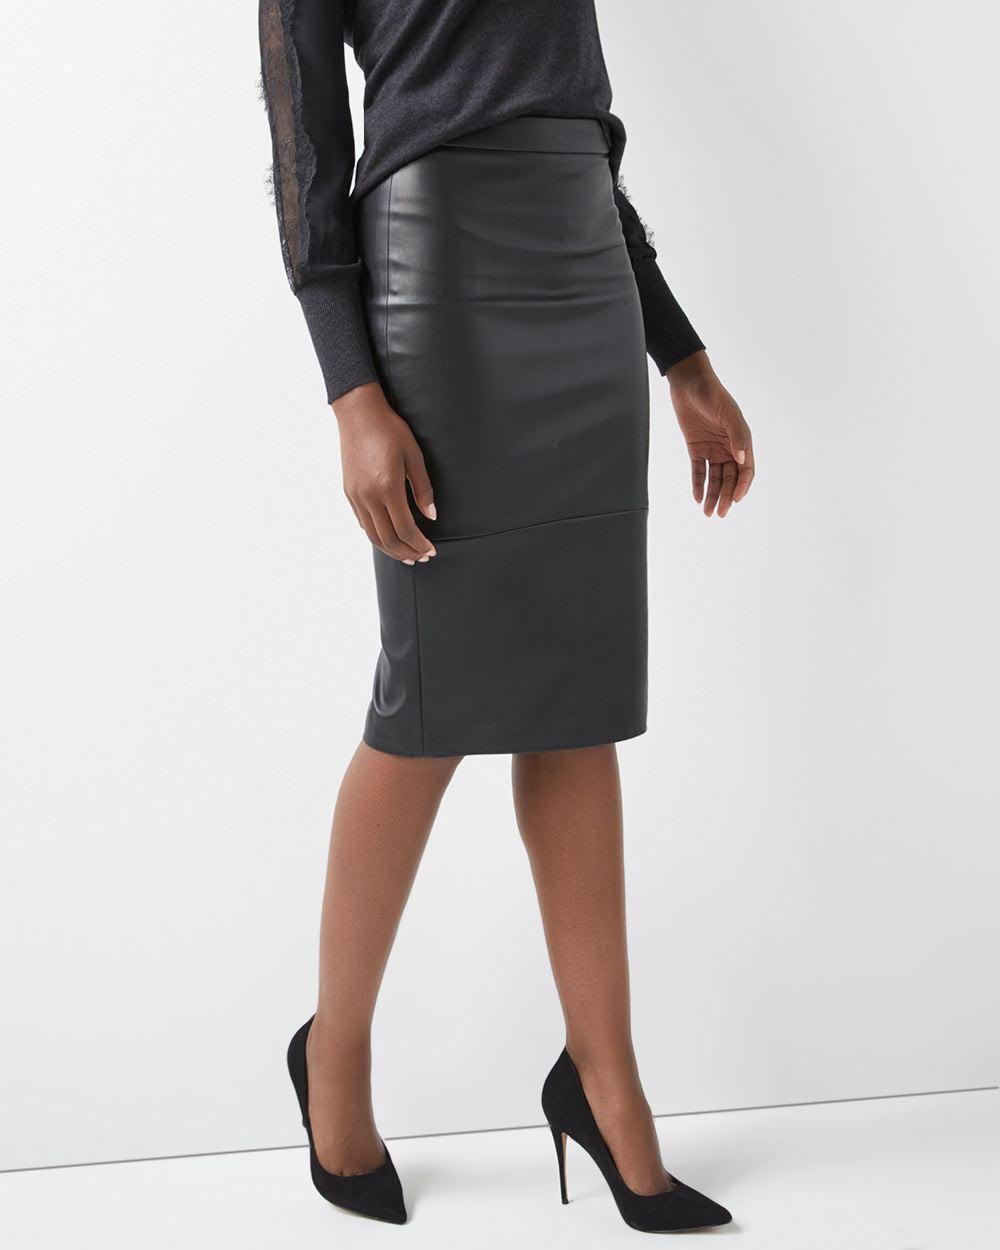 5a053e2af179 High-Waist Faux leather pencil skirt | RW&CO.